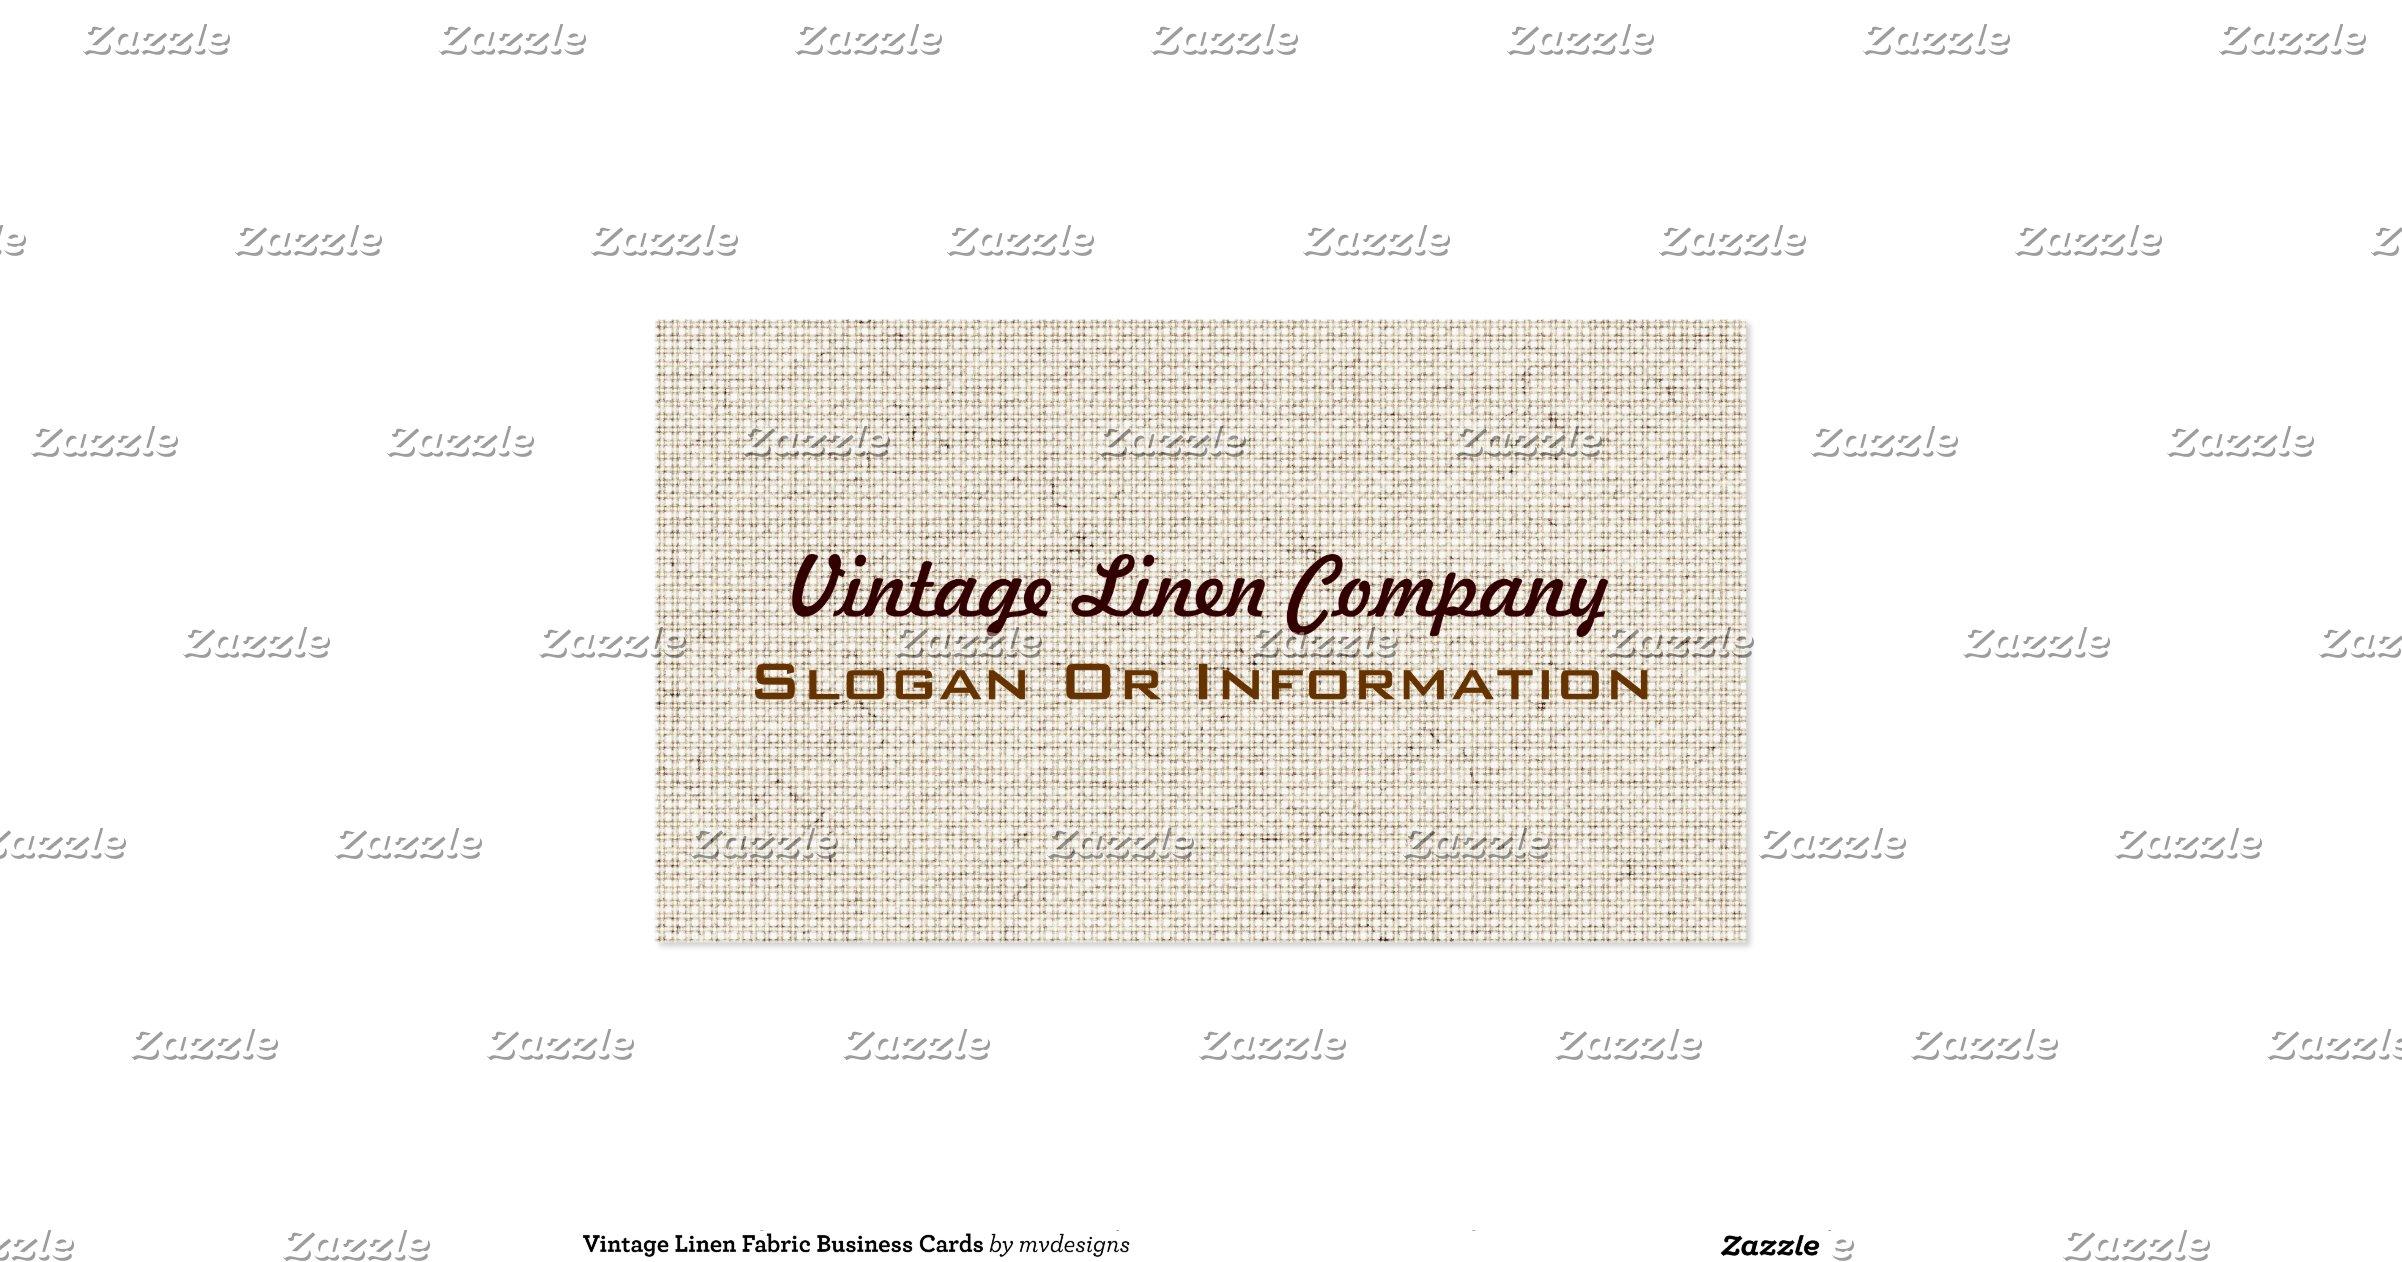 Vintage Linen Fabric Business Cards